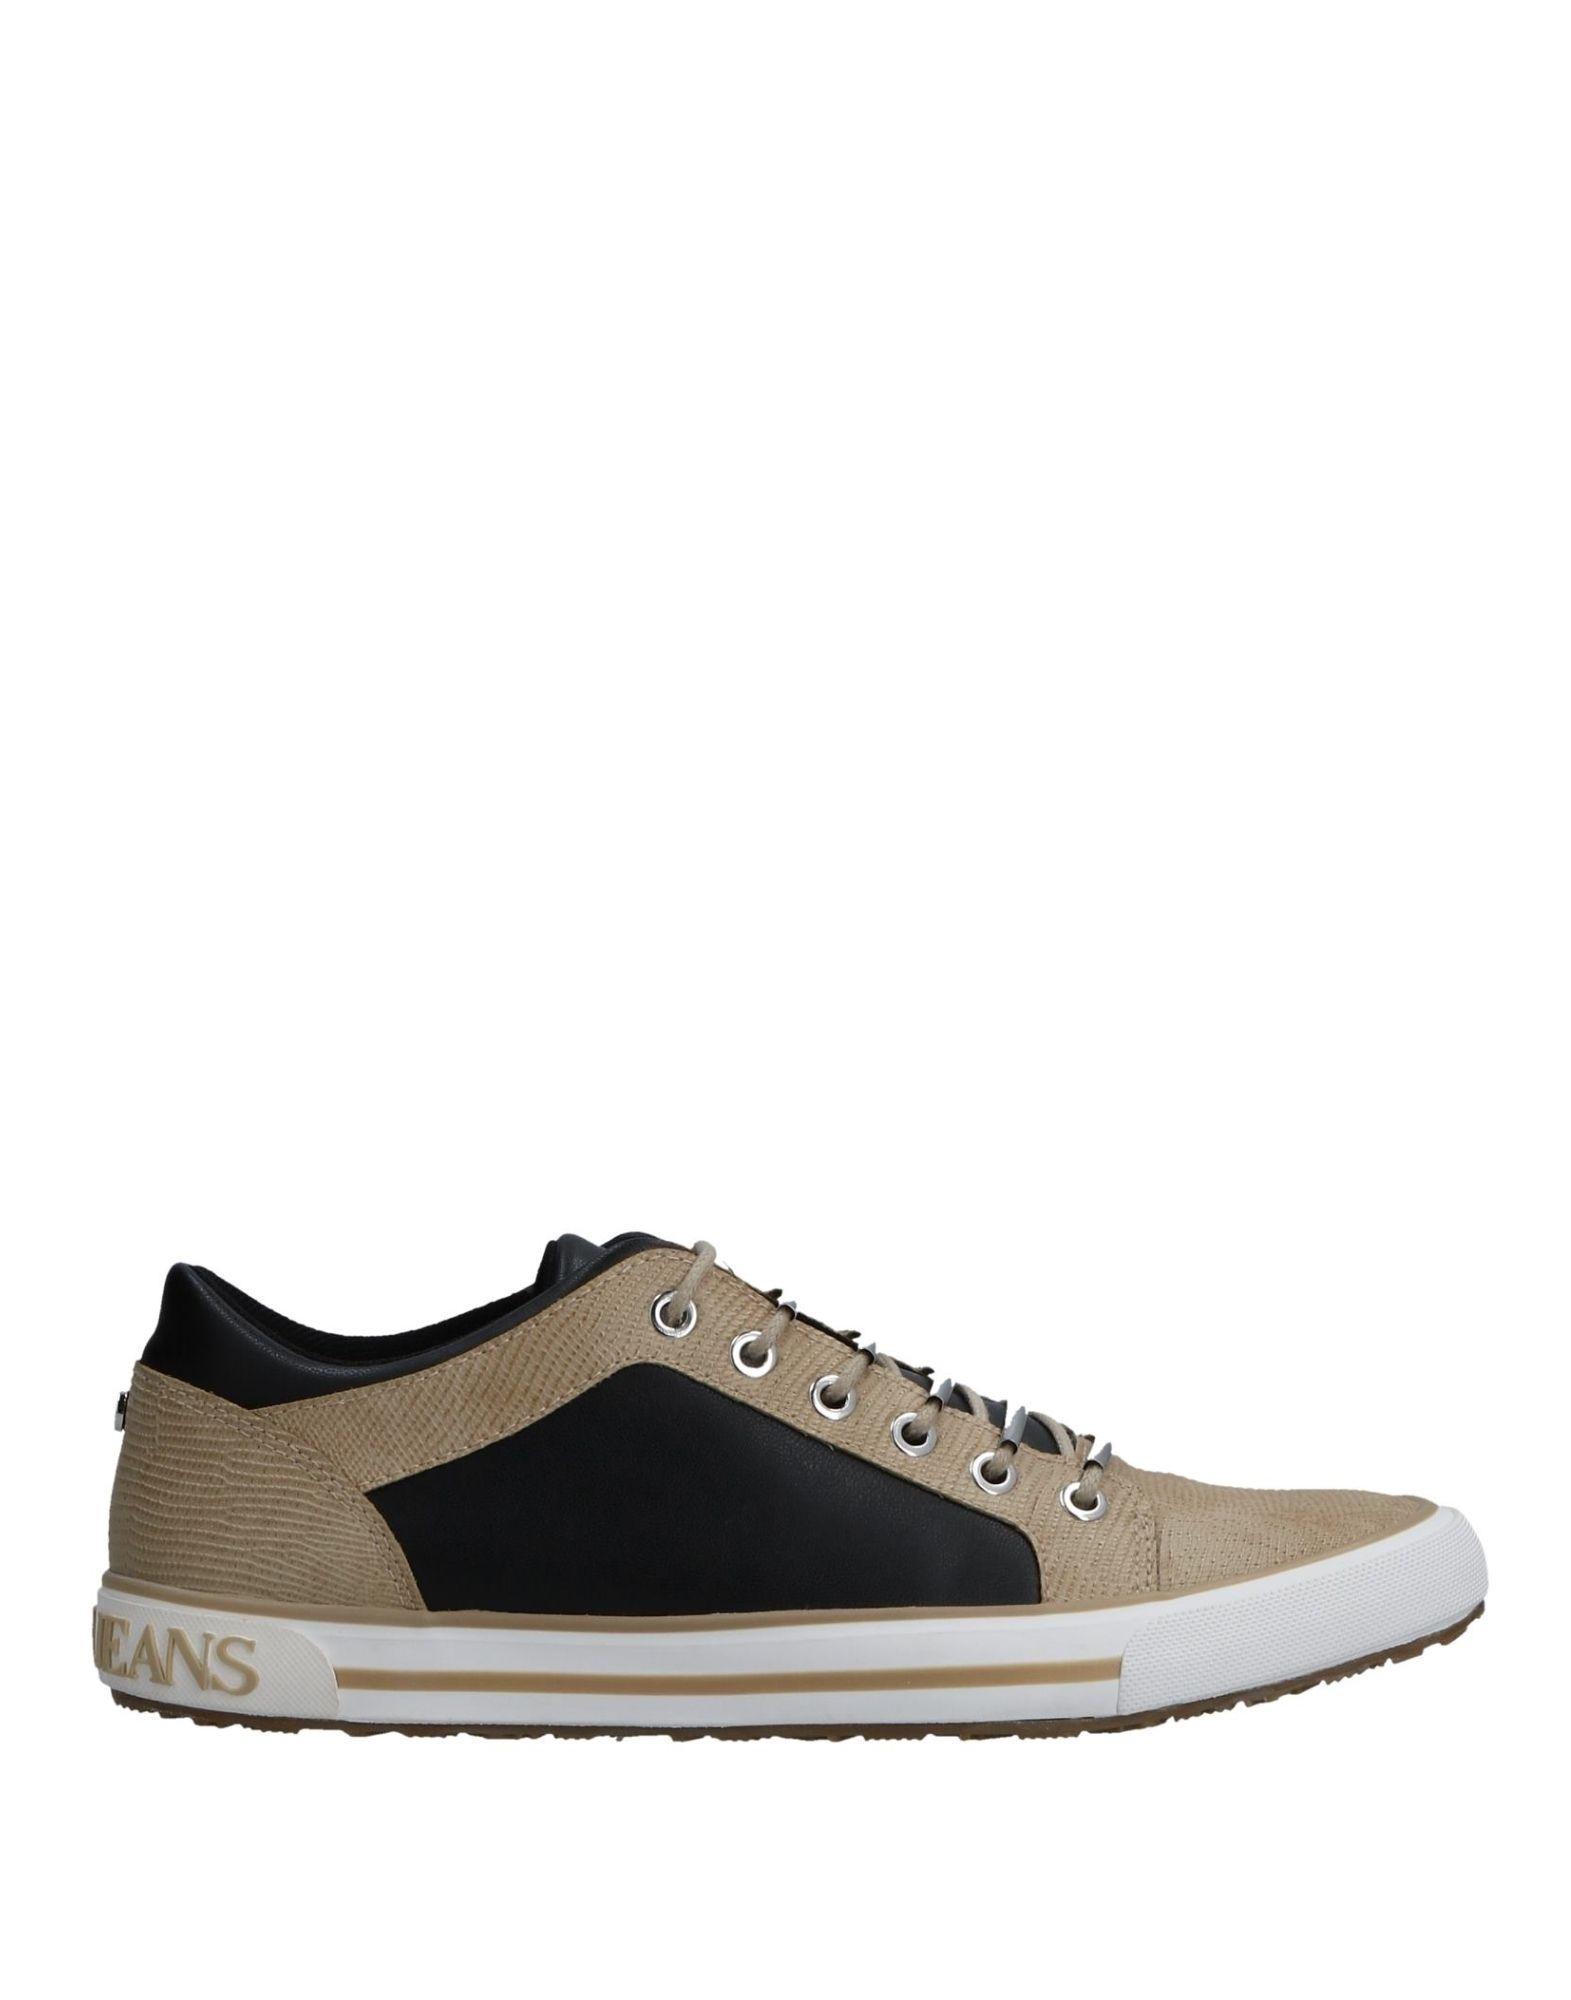 Armani Jeans Sneakers Damen  11527249UL Gute Qualität beliebte Schuhe